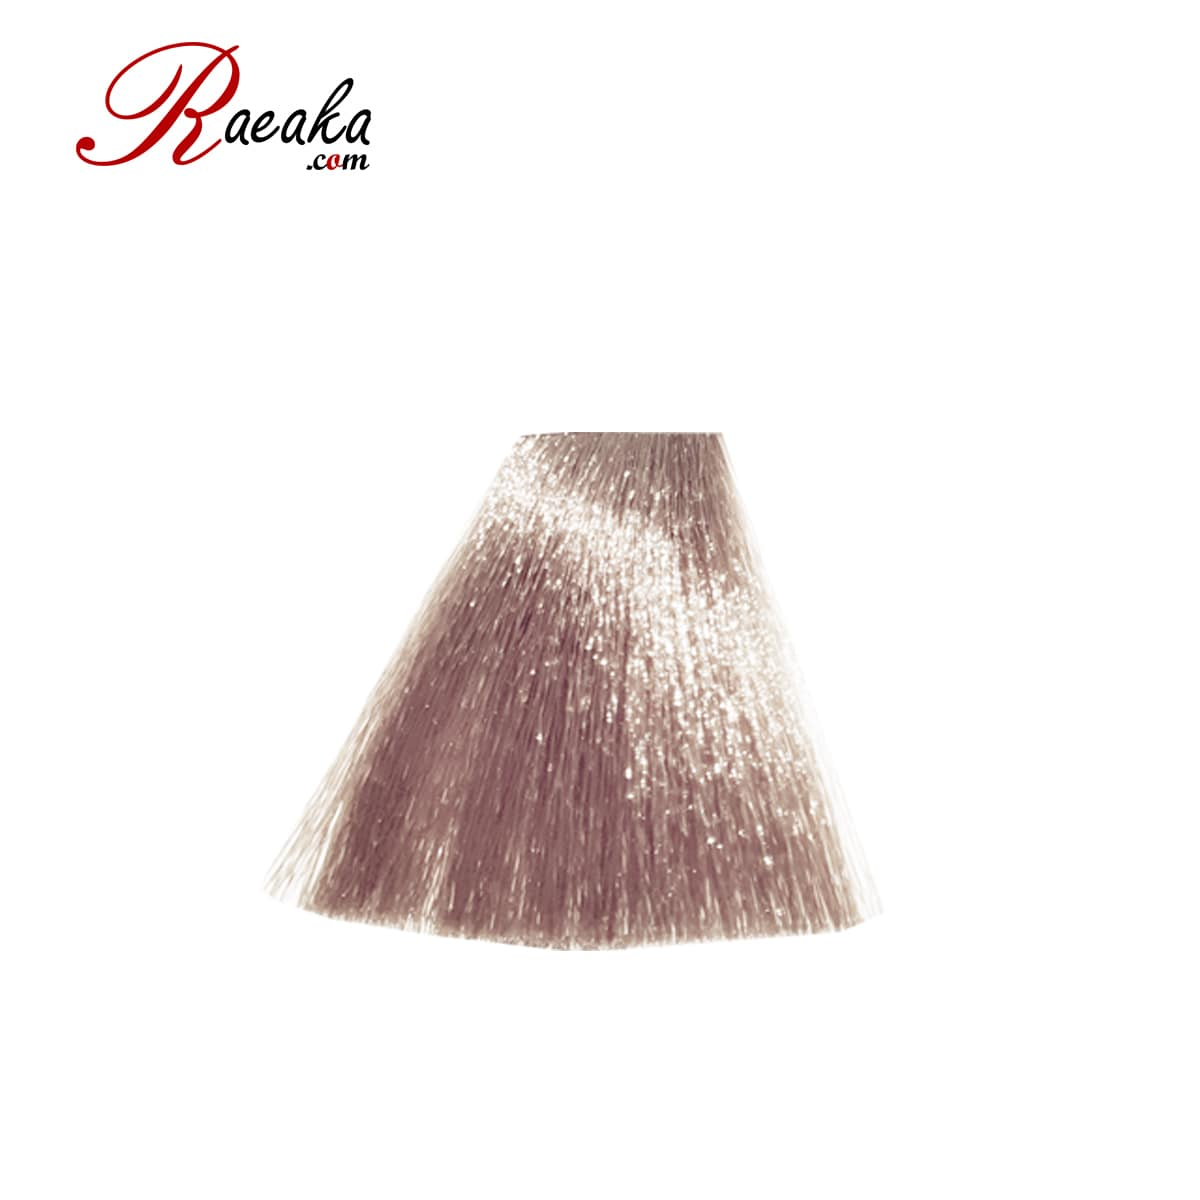 رنگ مو دوماسی سری لوکس رویال دایموند ۱۰٫۱۲۳ حجم ۱۲۰ میلی لیتر